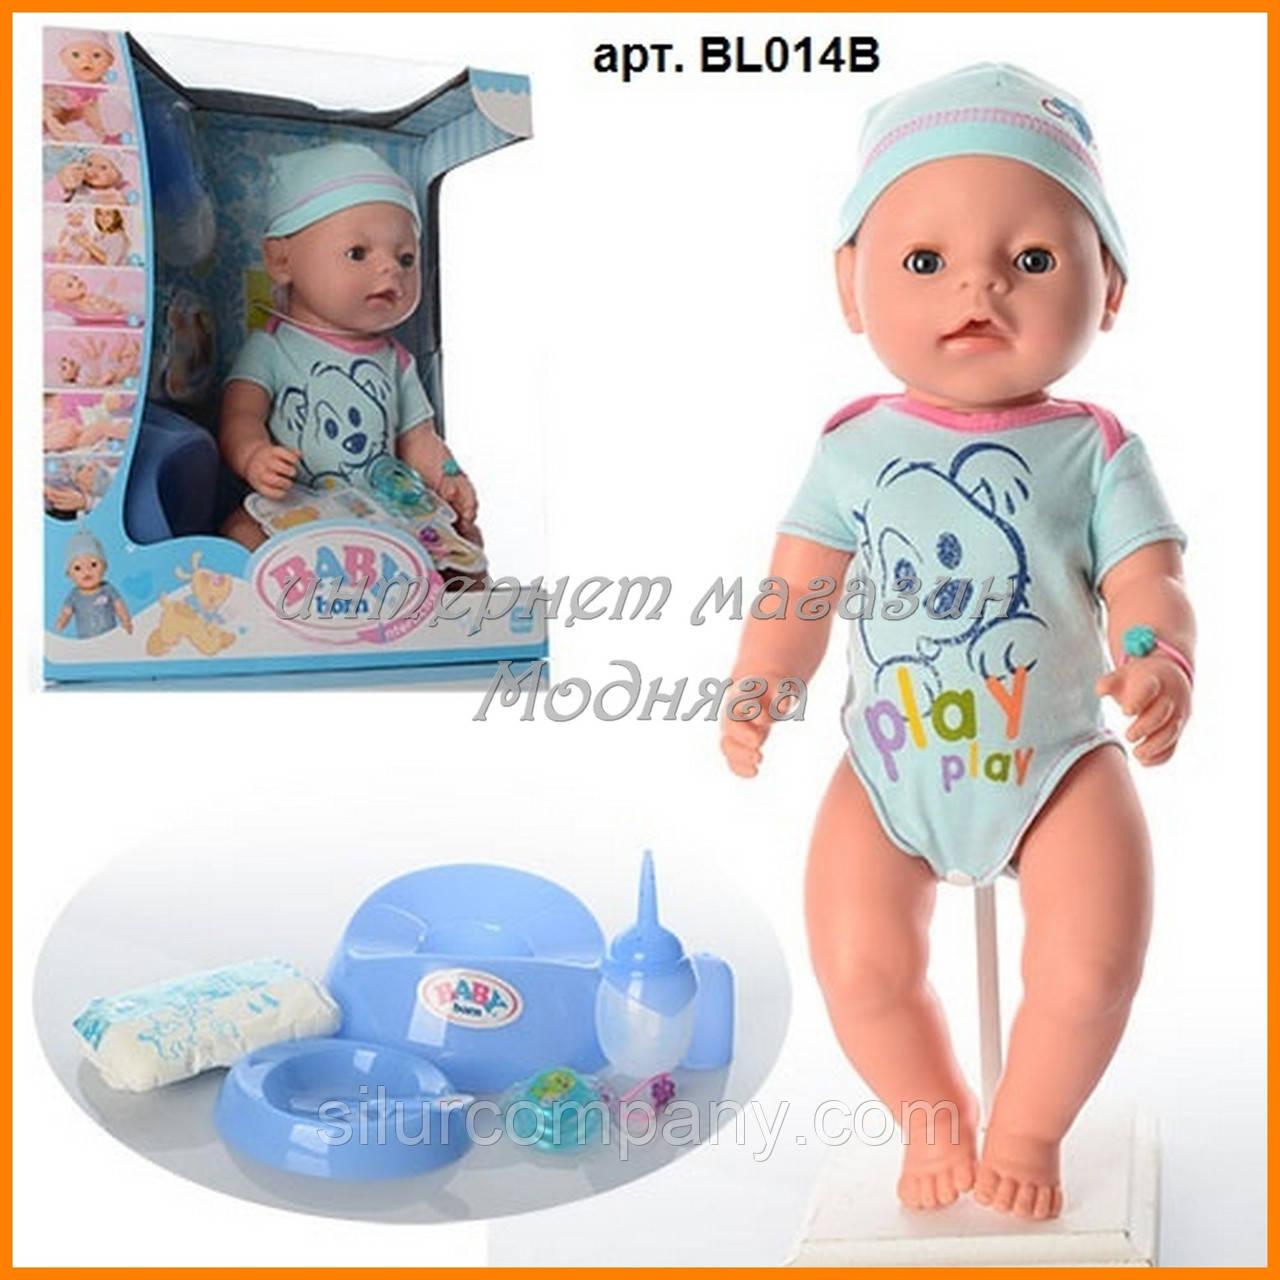 dddd4a5c4704 Пупс кукла Baby Born Беби Борн BL014B-S Малятко немовлятко новорожденный с  аксессуарами